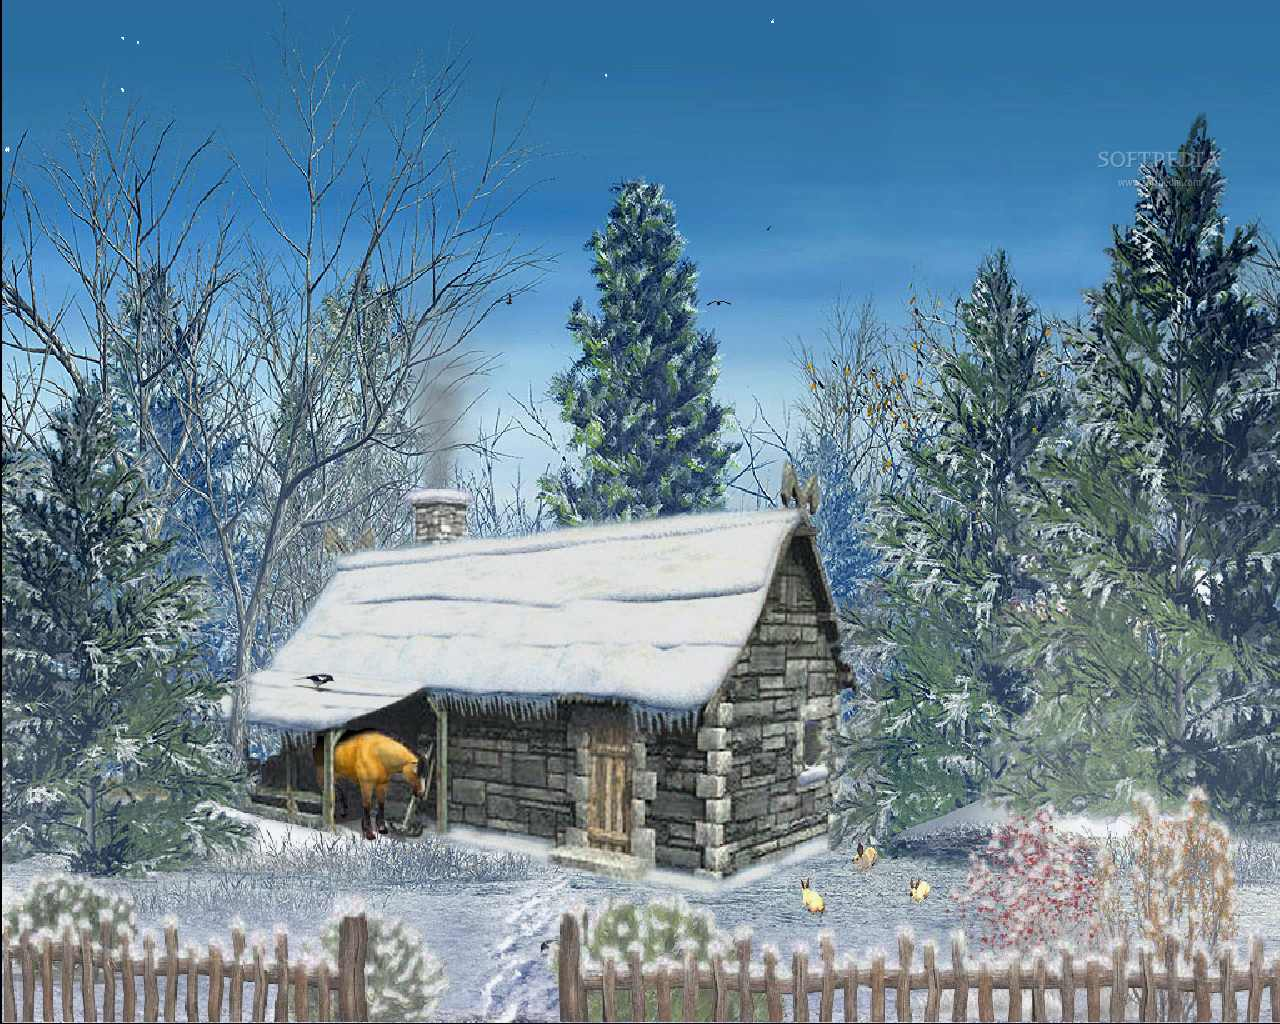 http://4.bp.blogspot.com/_Kxu6Sf2ZJHo/TStqsj-YDBI/AAAAAAAAATY/mnoHujfXChY/s1600/Snowy-Hut-Animated-Wallpaper_1.jpg